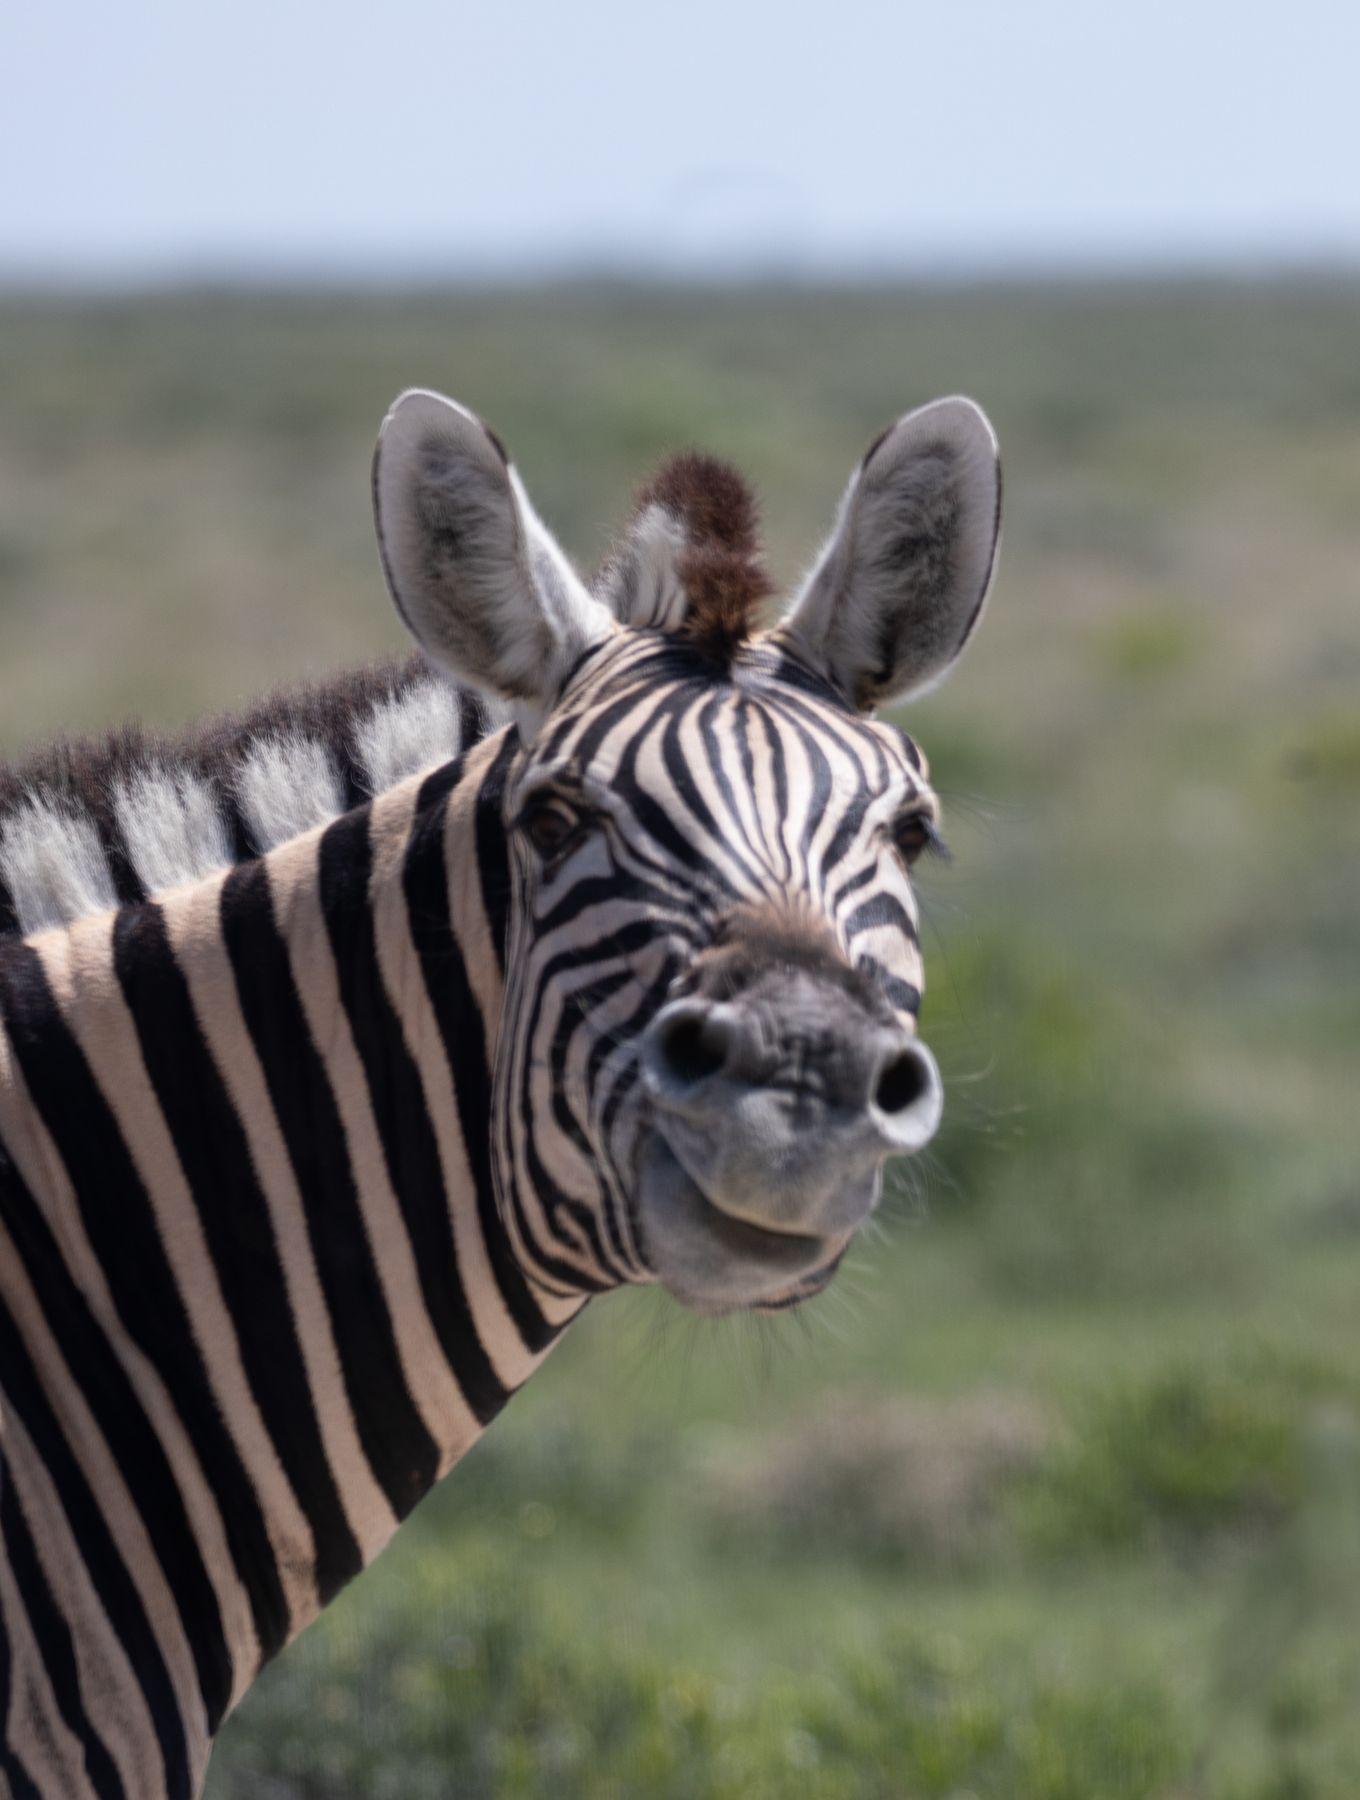 Смеющаяся зебра африка намибия путешествия сафари зебра животные